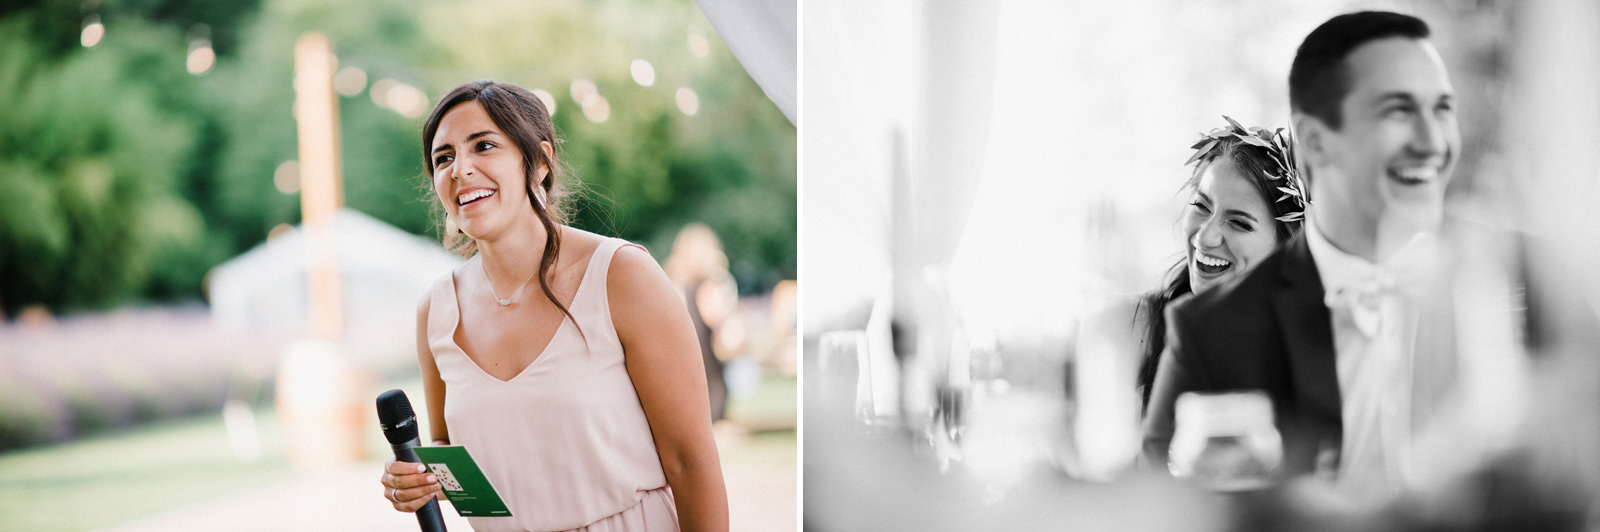 065-woodinville-lavendar-farm-wedding-with-golden-glowy-photos.jpg